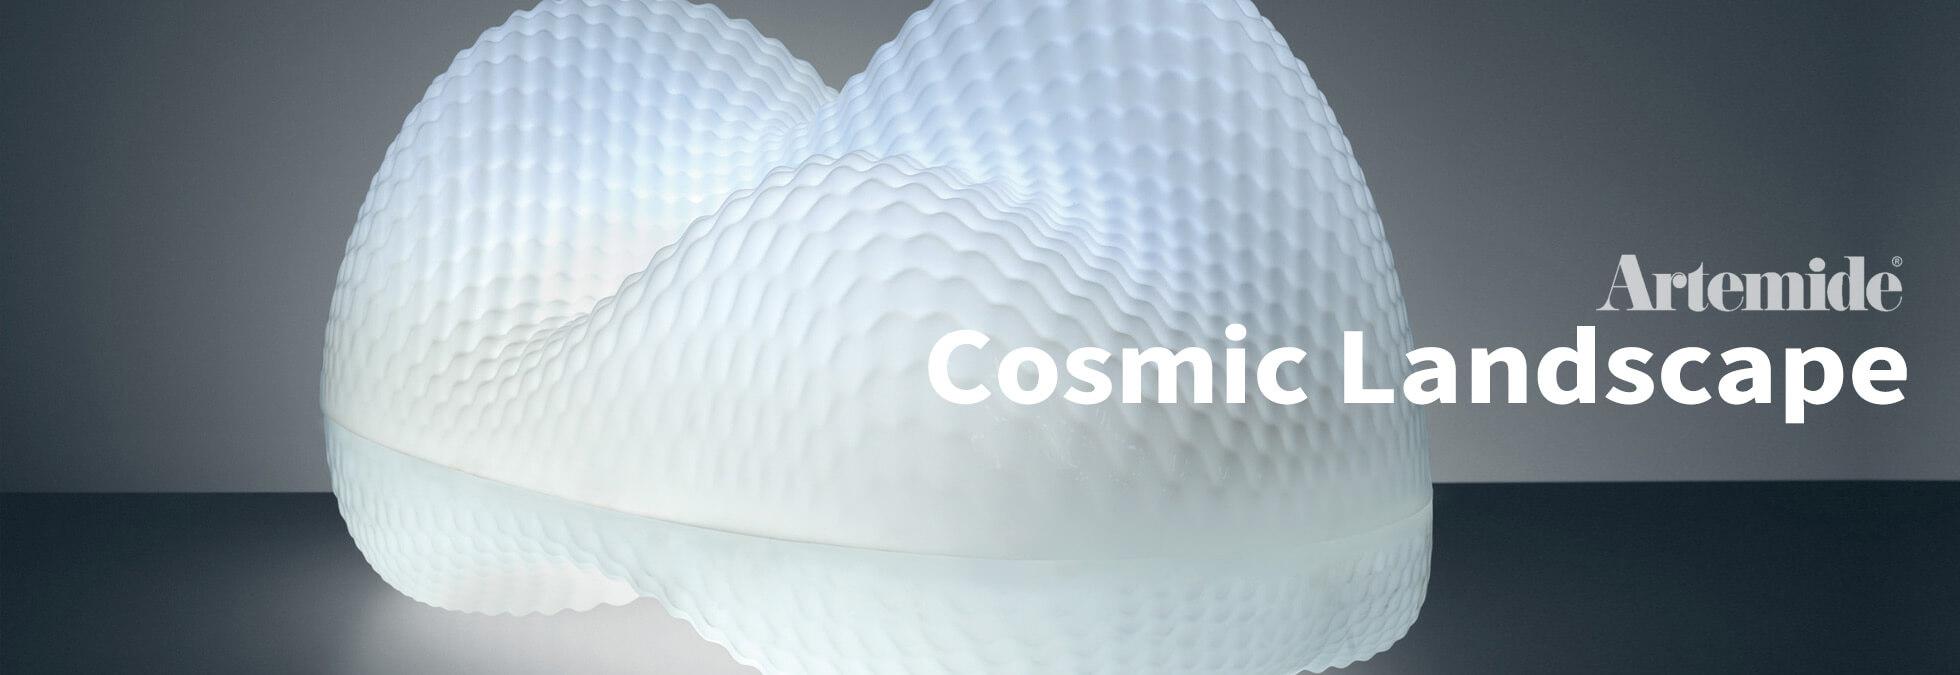 Artemide Cosmic Landscape